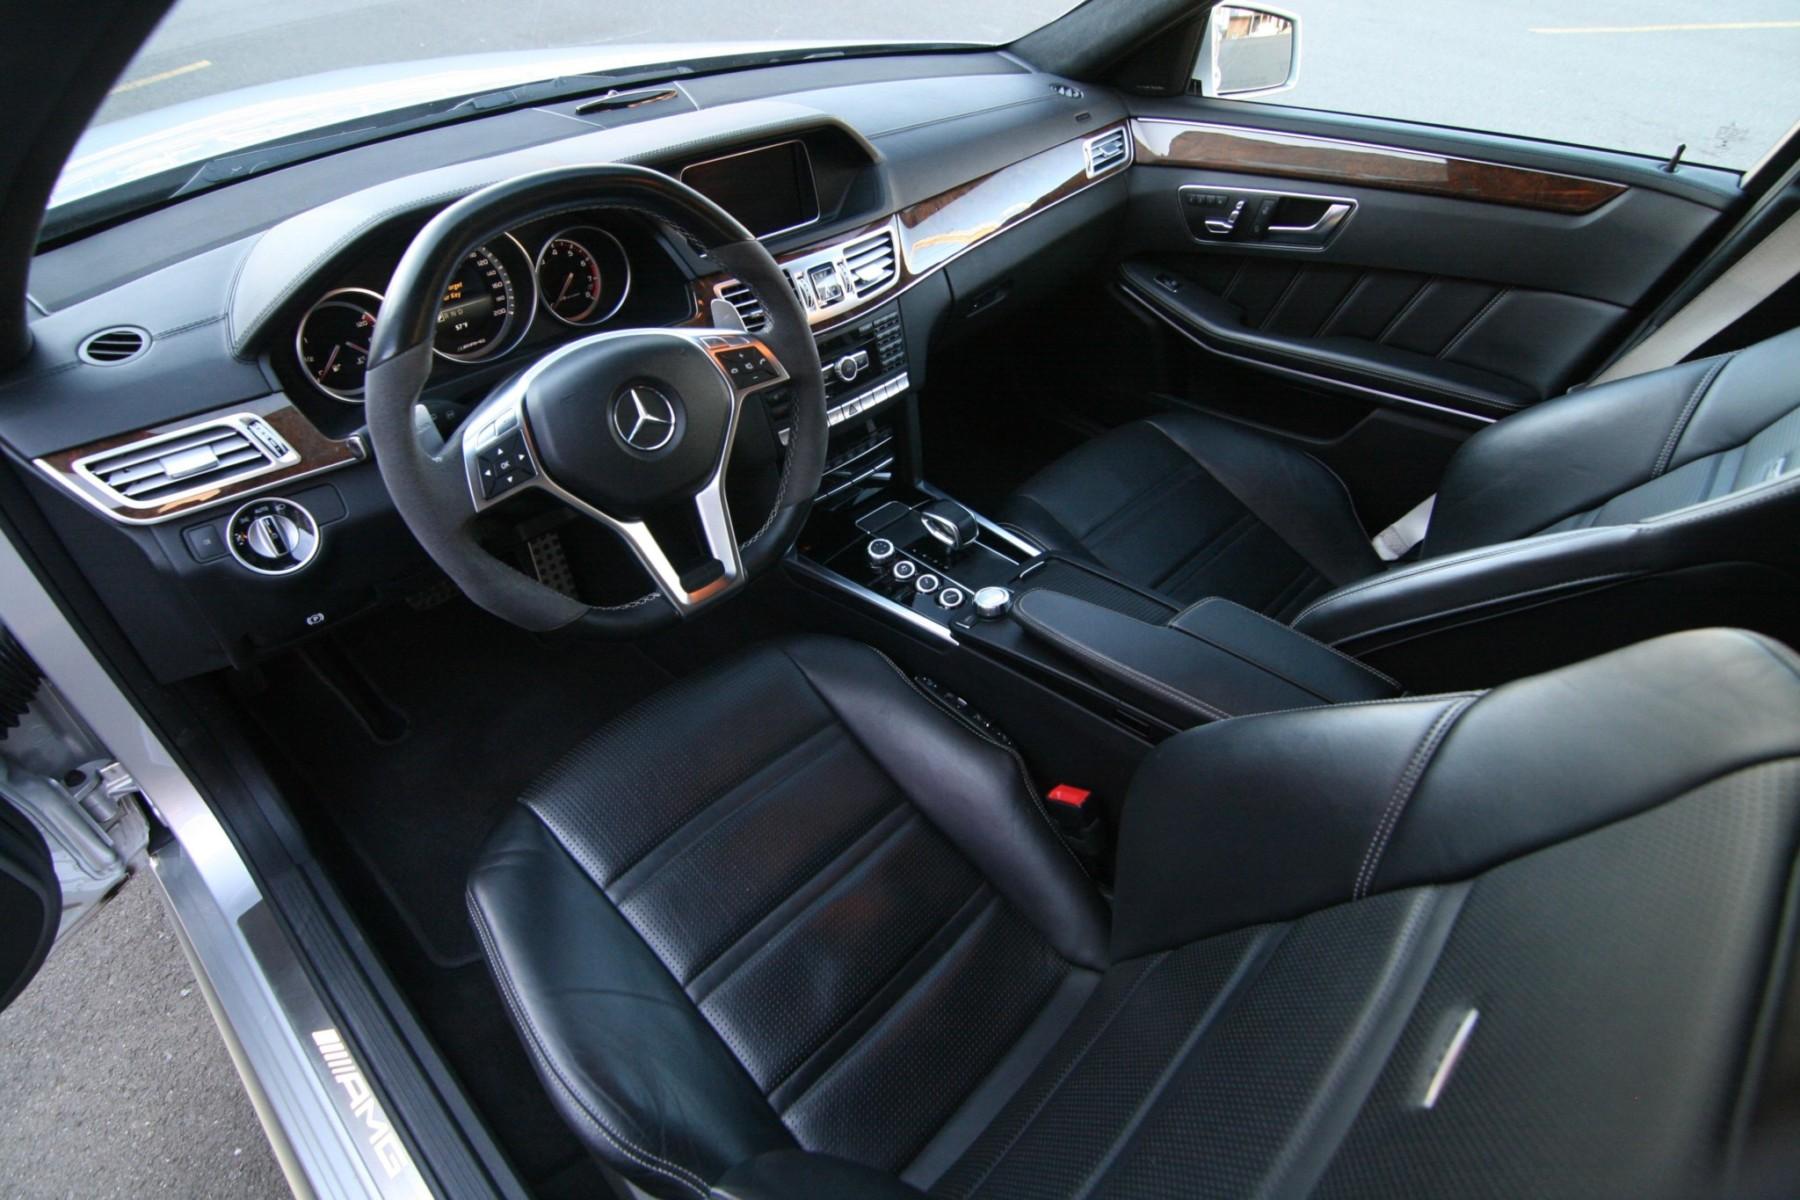 Mercedes-Benz E63 S AMG 4MATIC Wagon 12